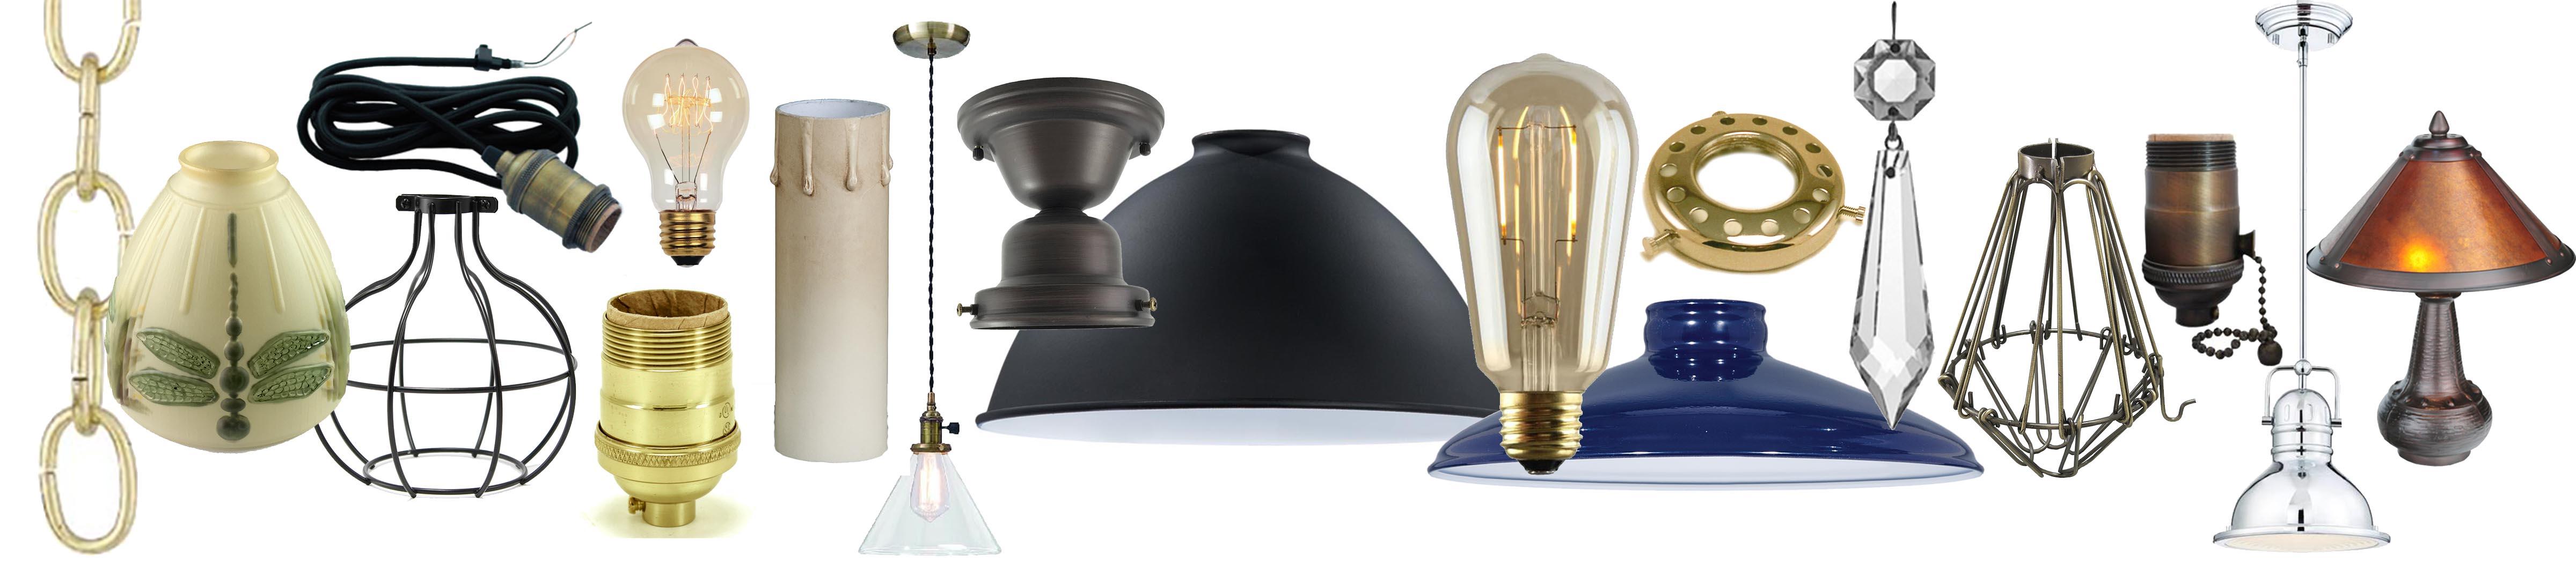 lighting lamp parts